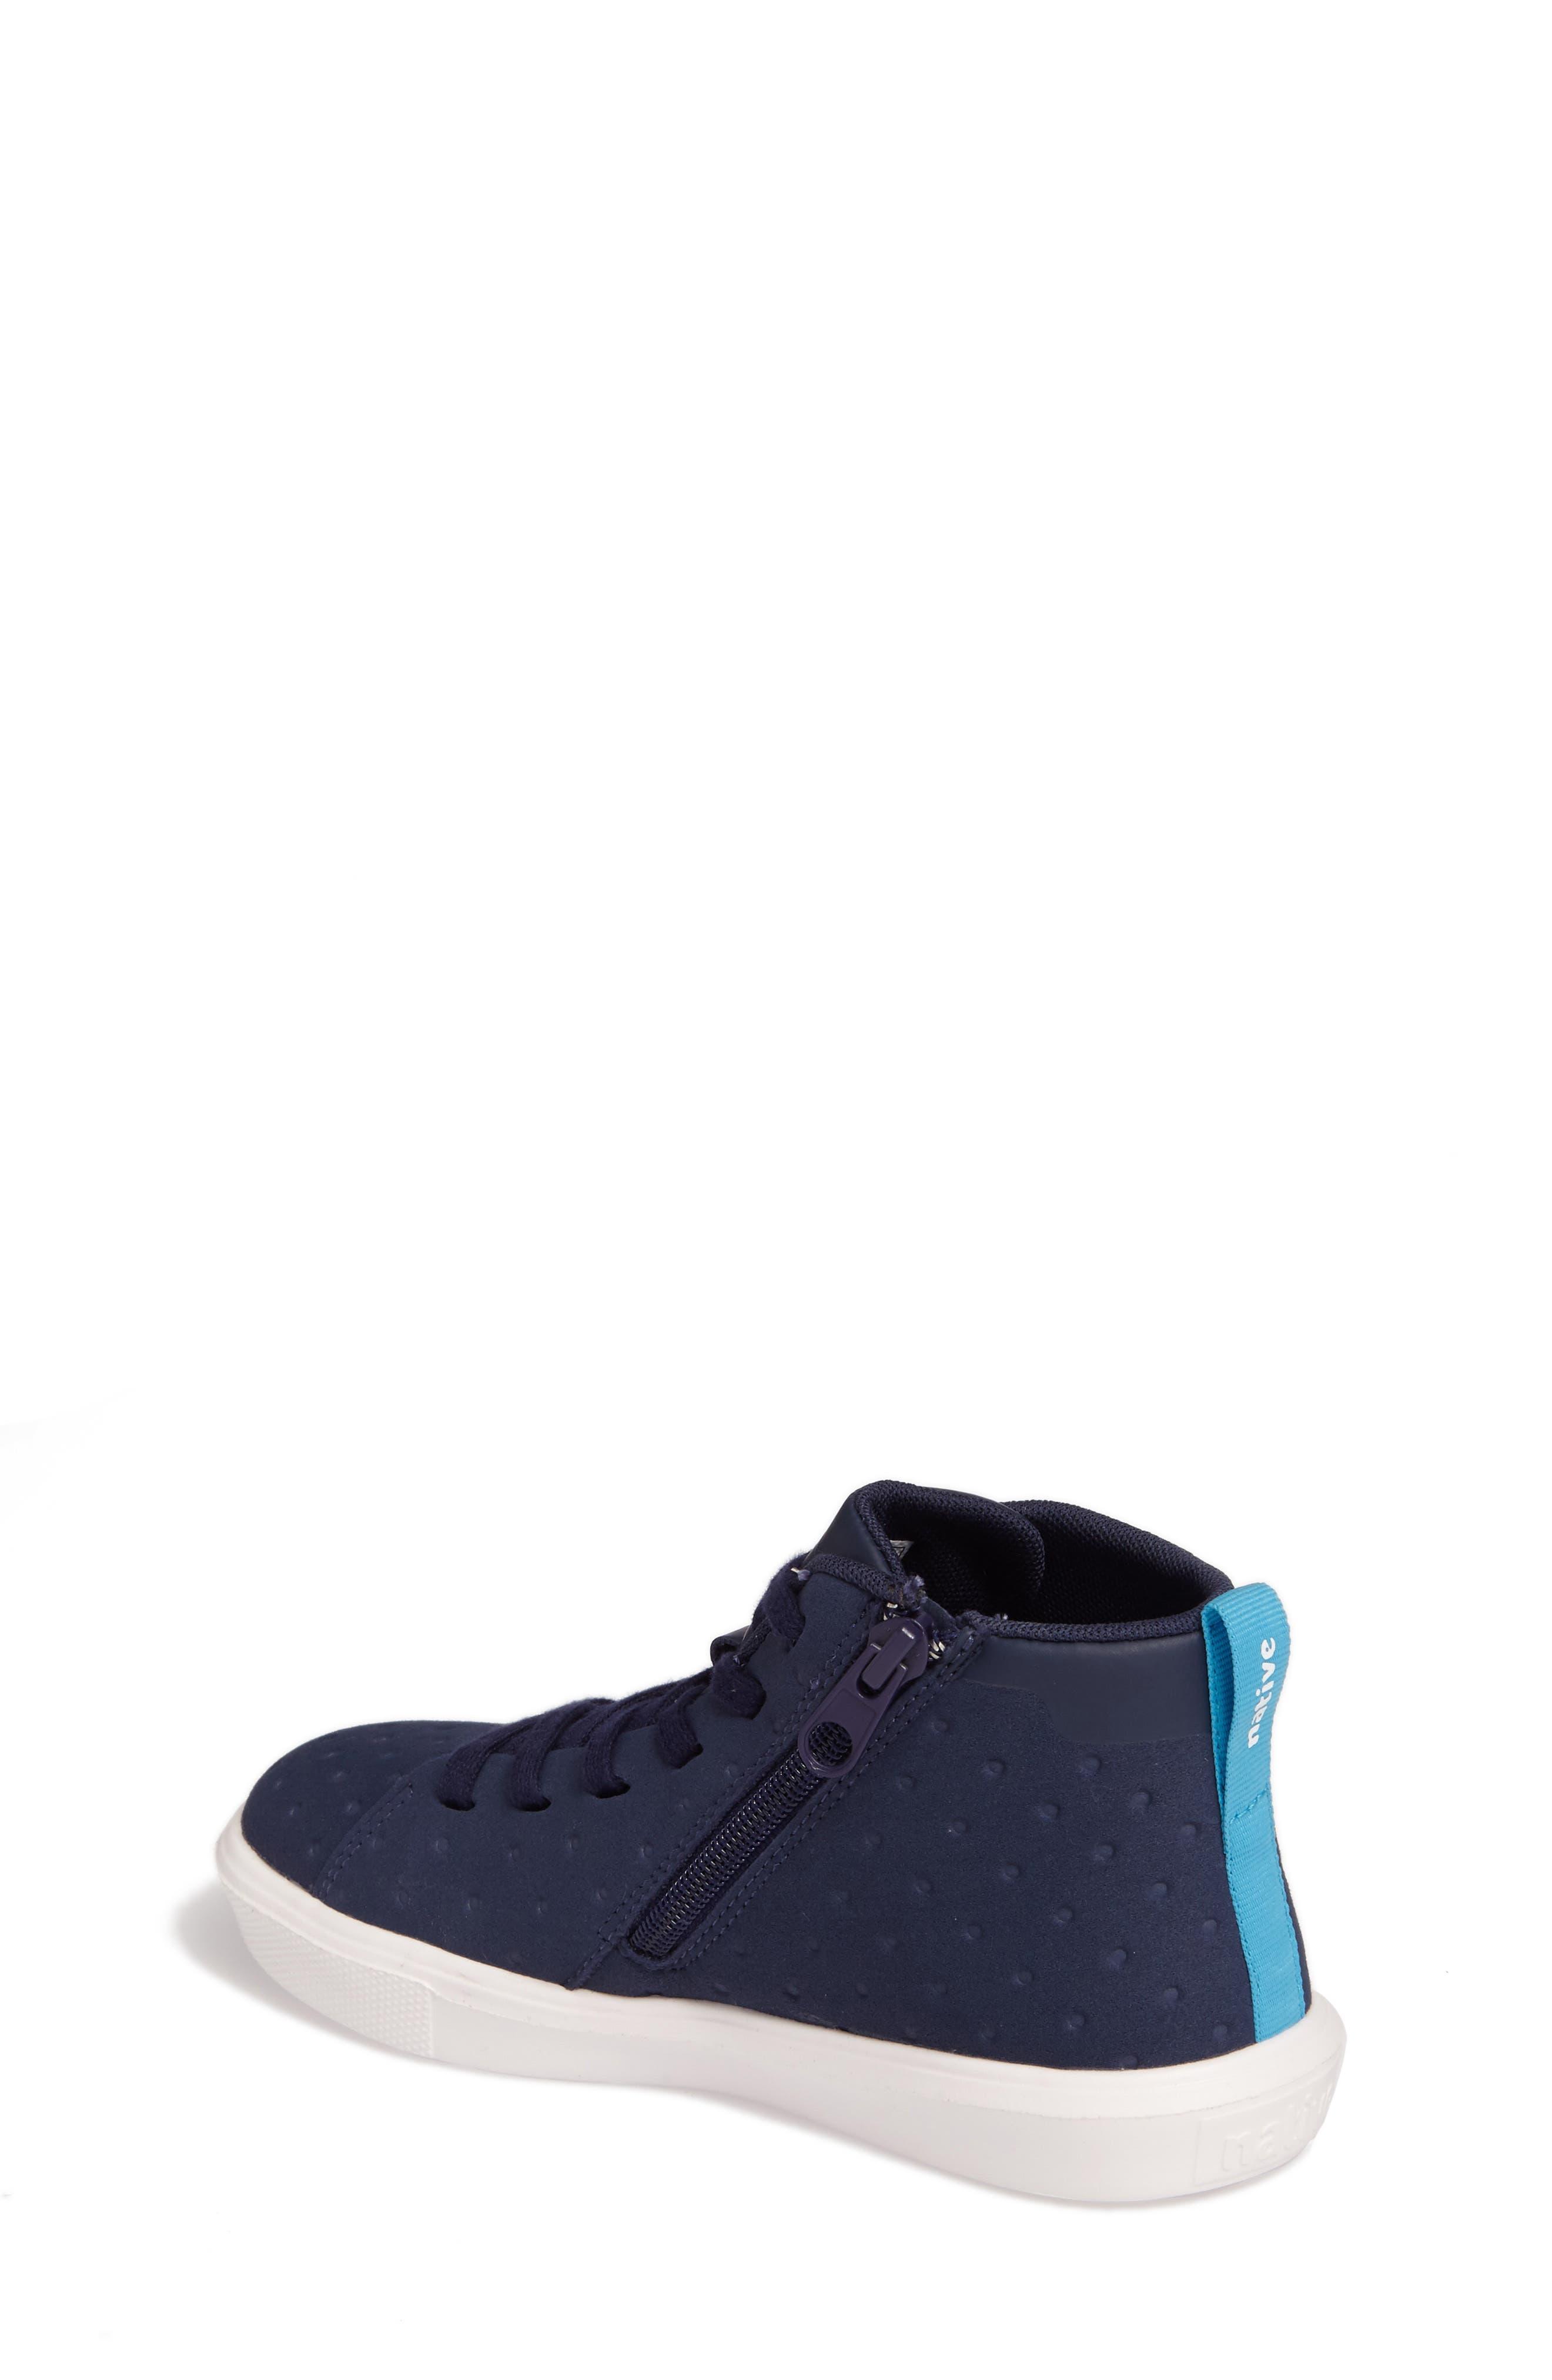 Native Monaco Sneaker,                             Alternate thumbnail 2, color,                             Regatta Blue/ Shell White